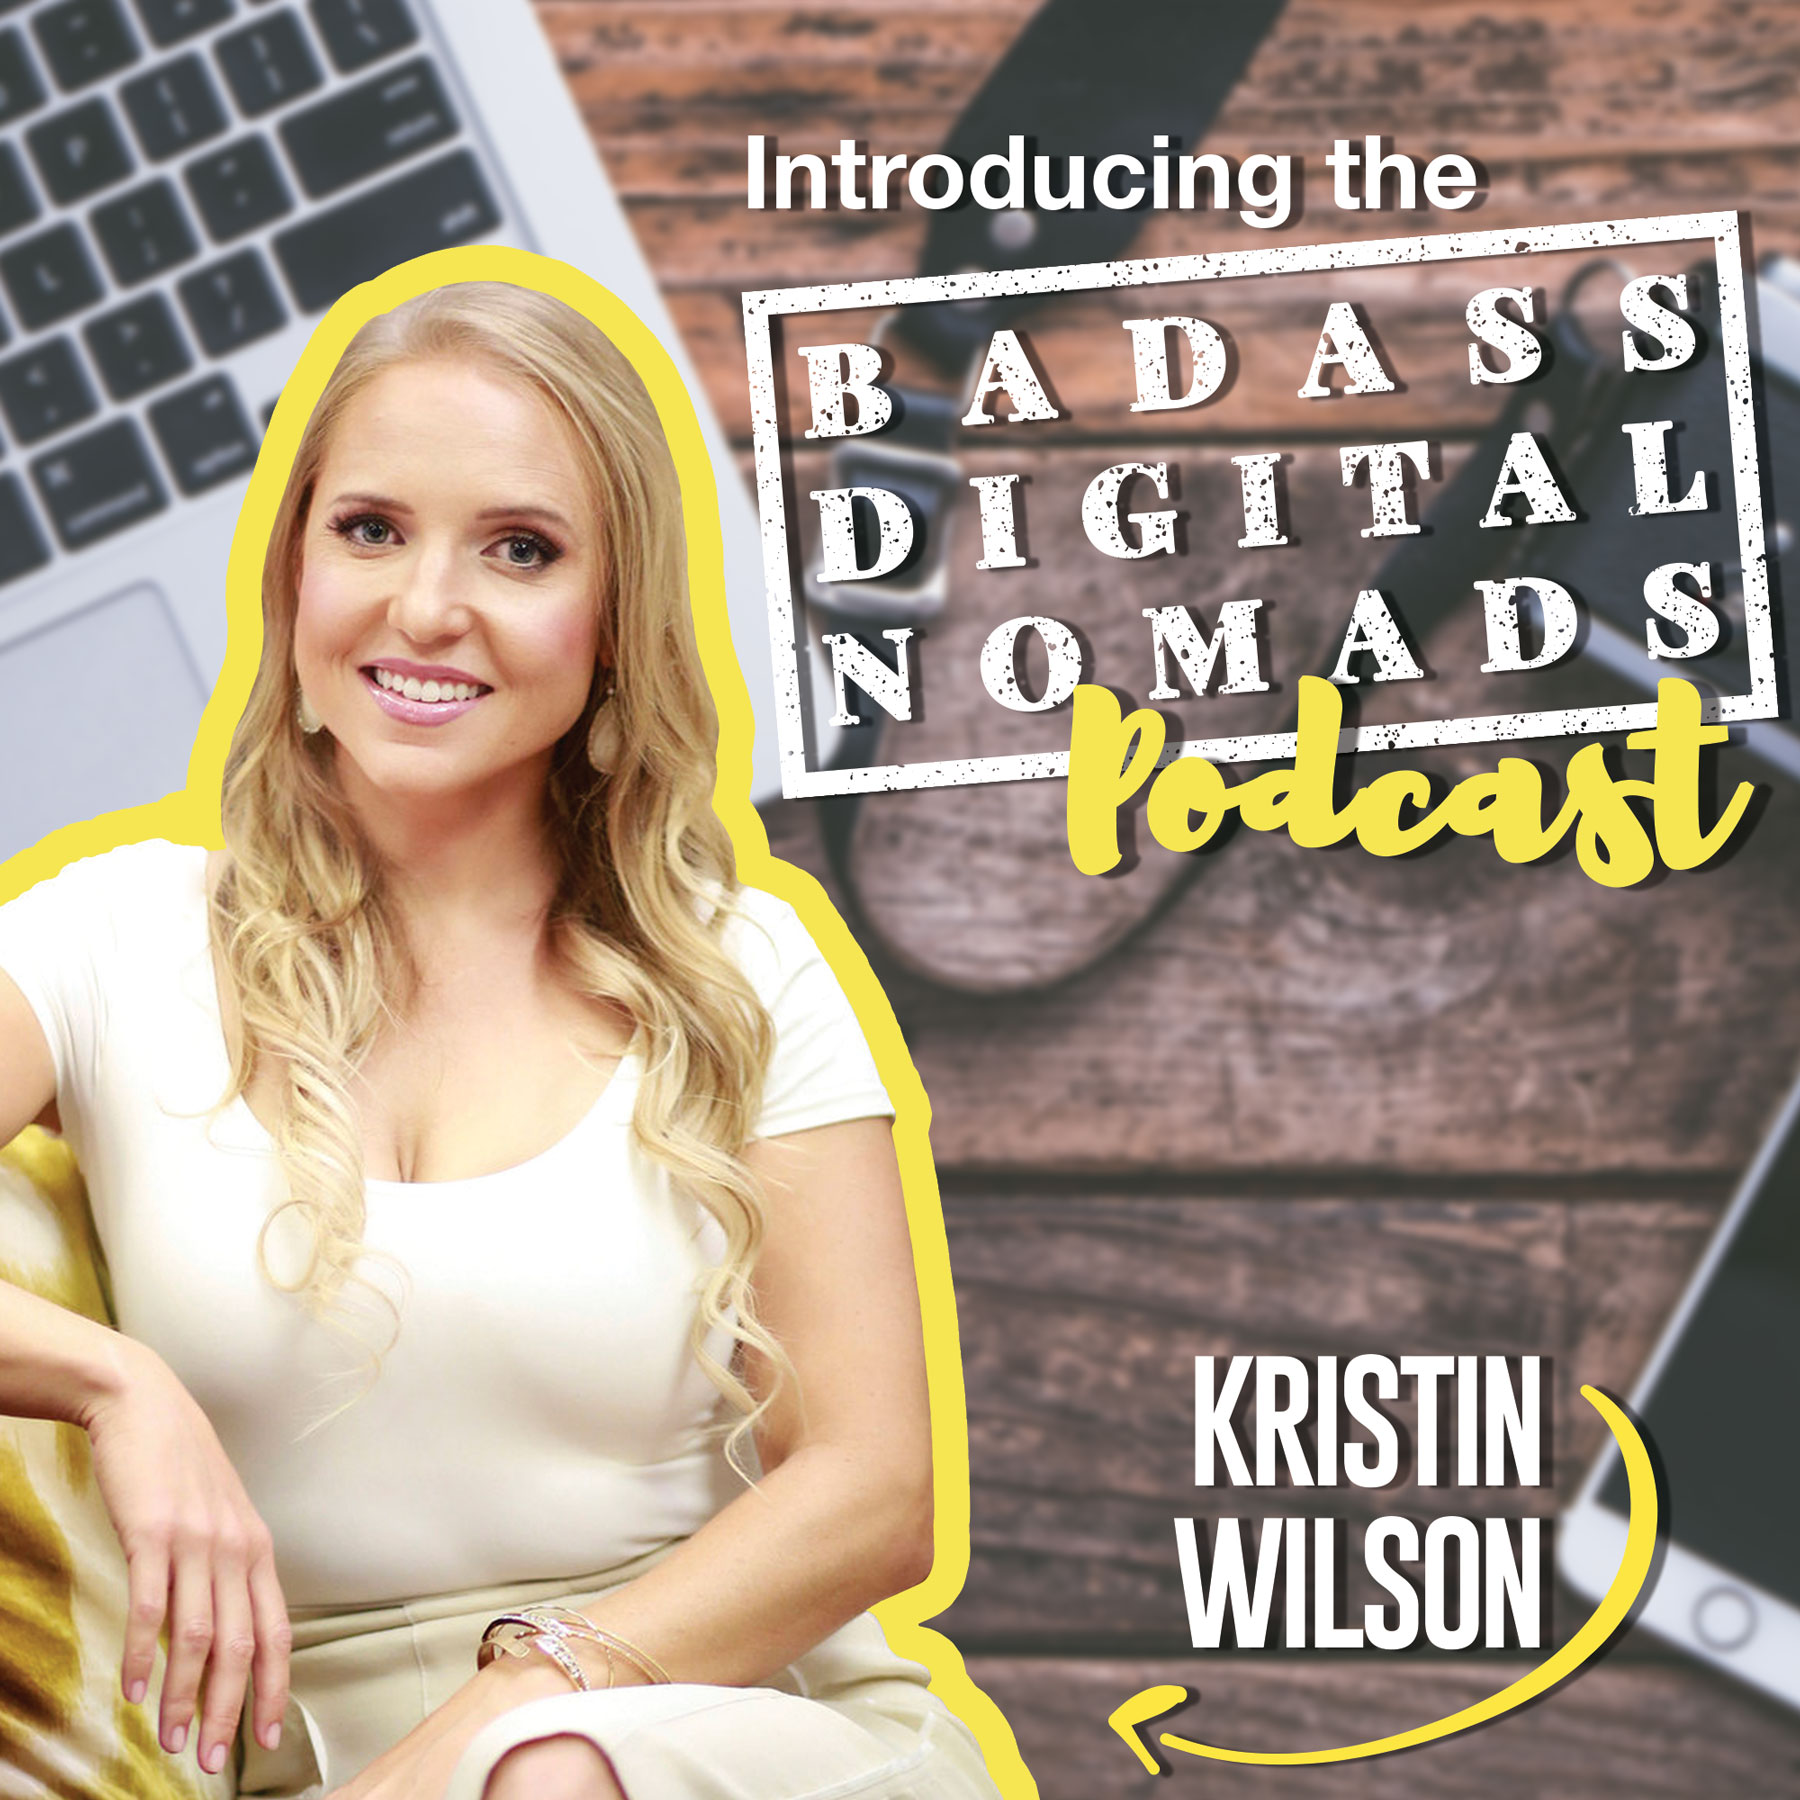 Badass Digital Nomads Podcast Intro.jpg